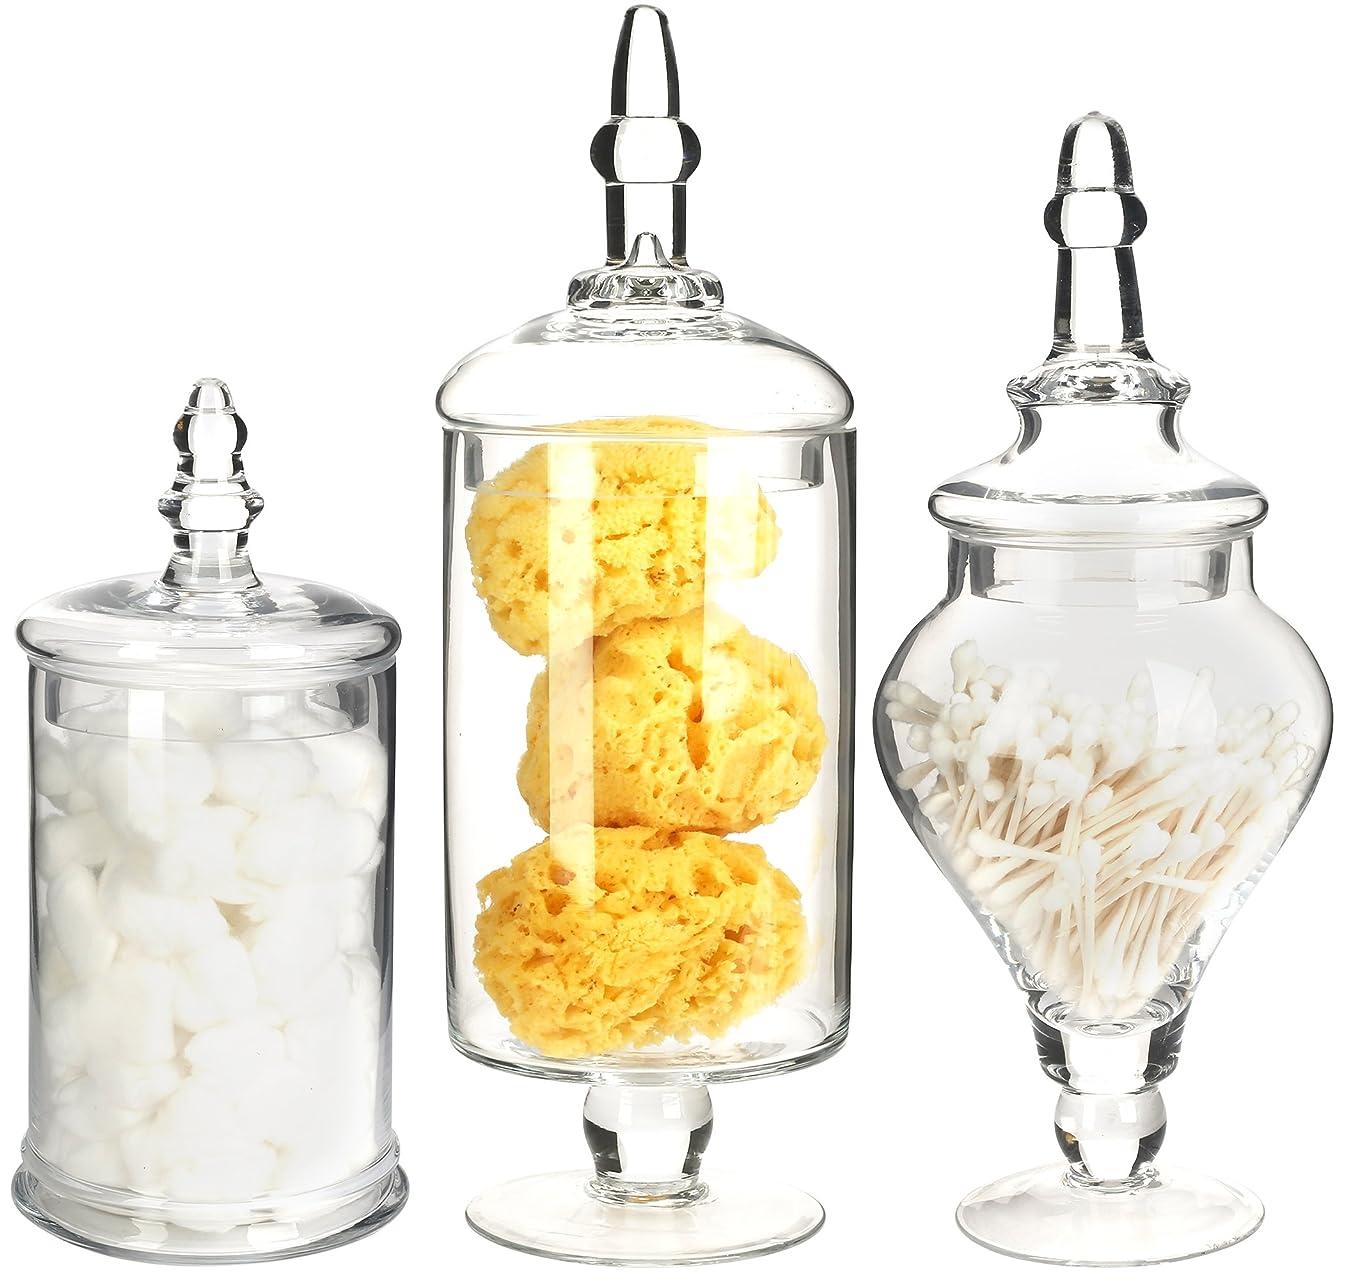 Mantello Decor Glass Apothecary Jars (Clear, Medium, Set of 3)